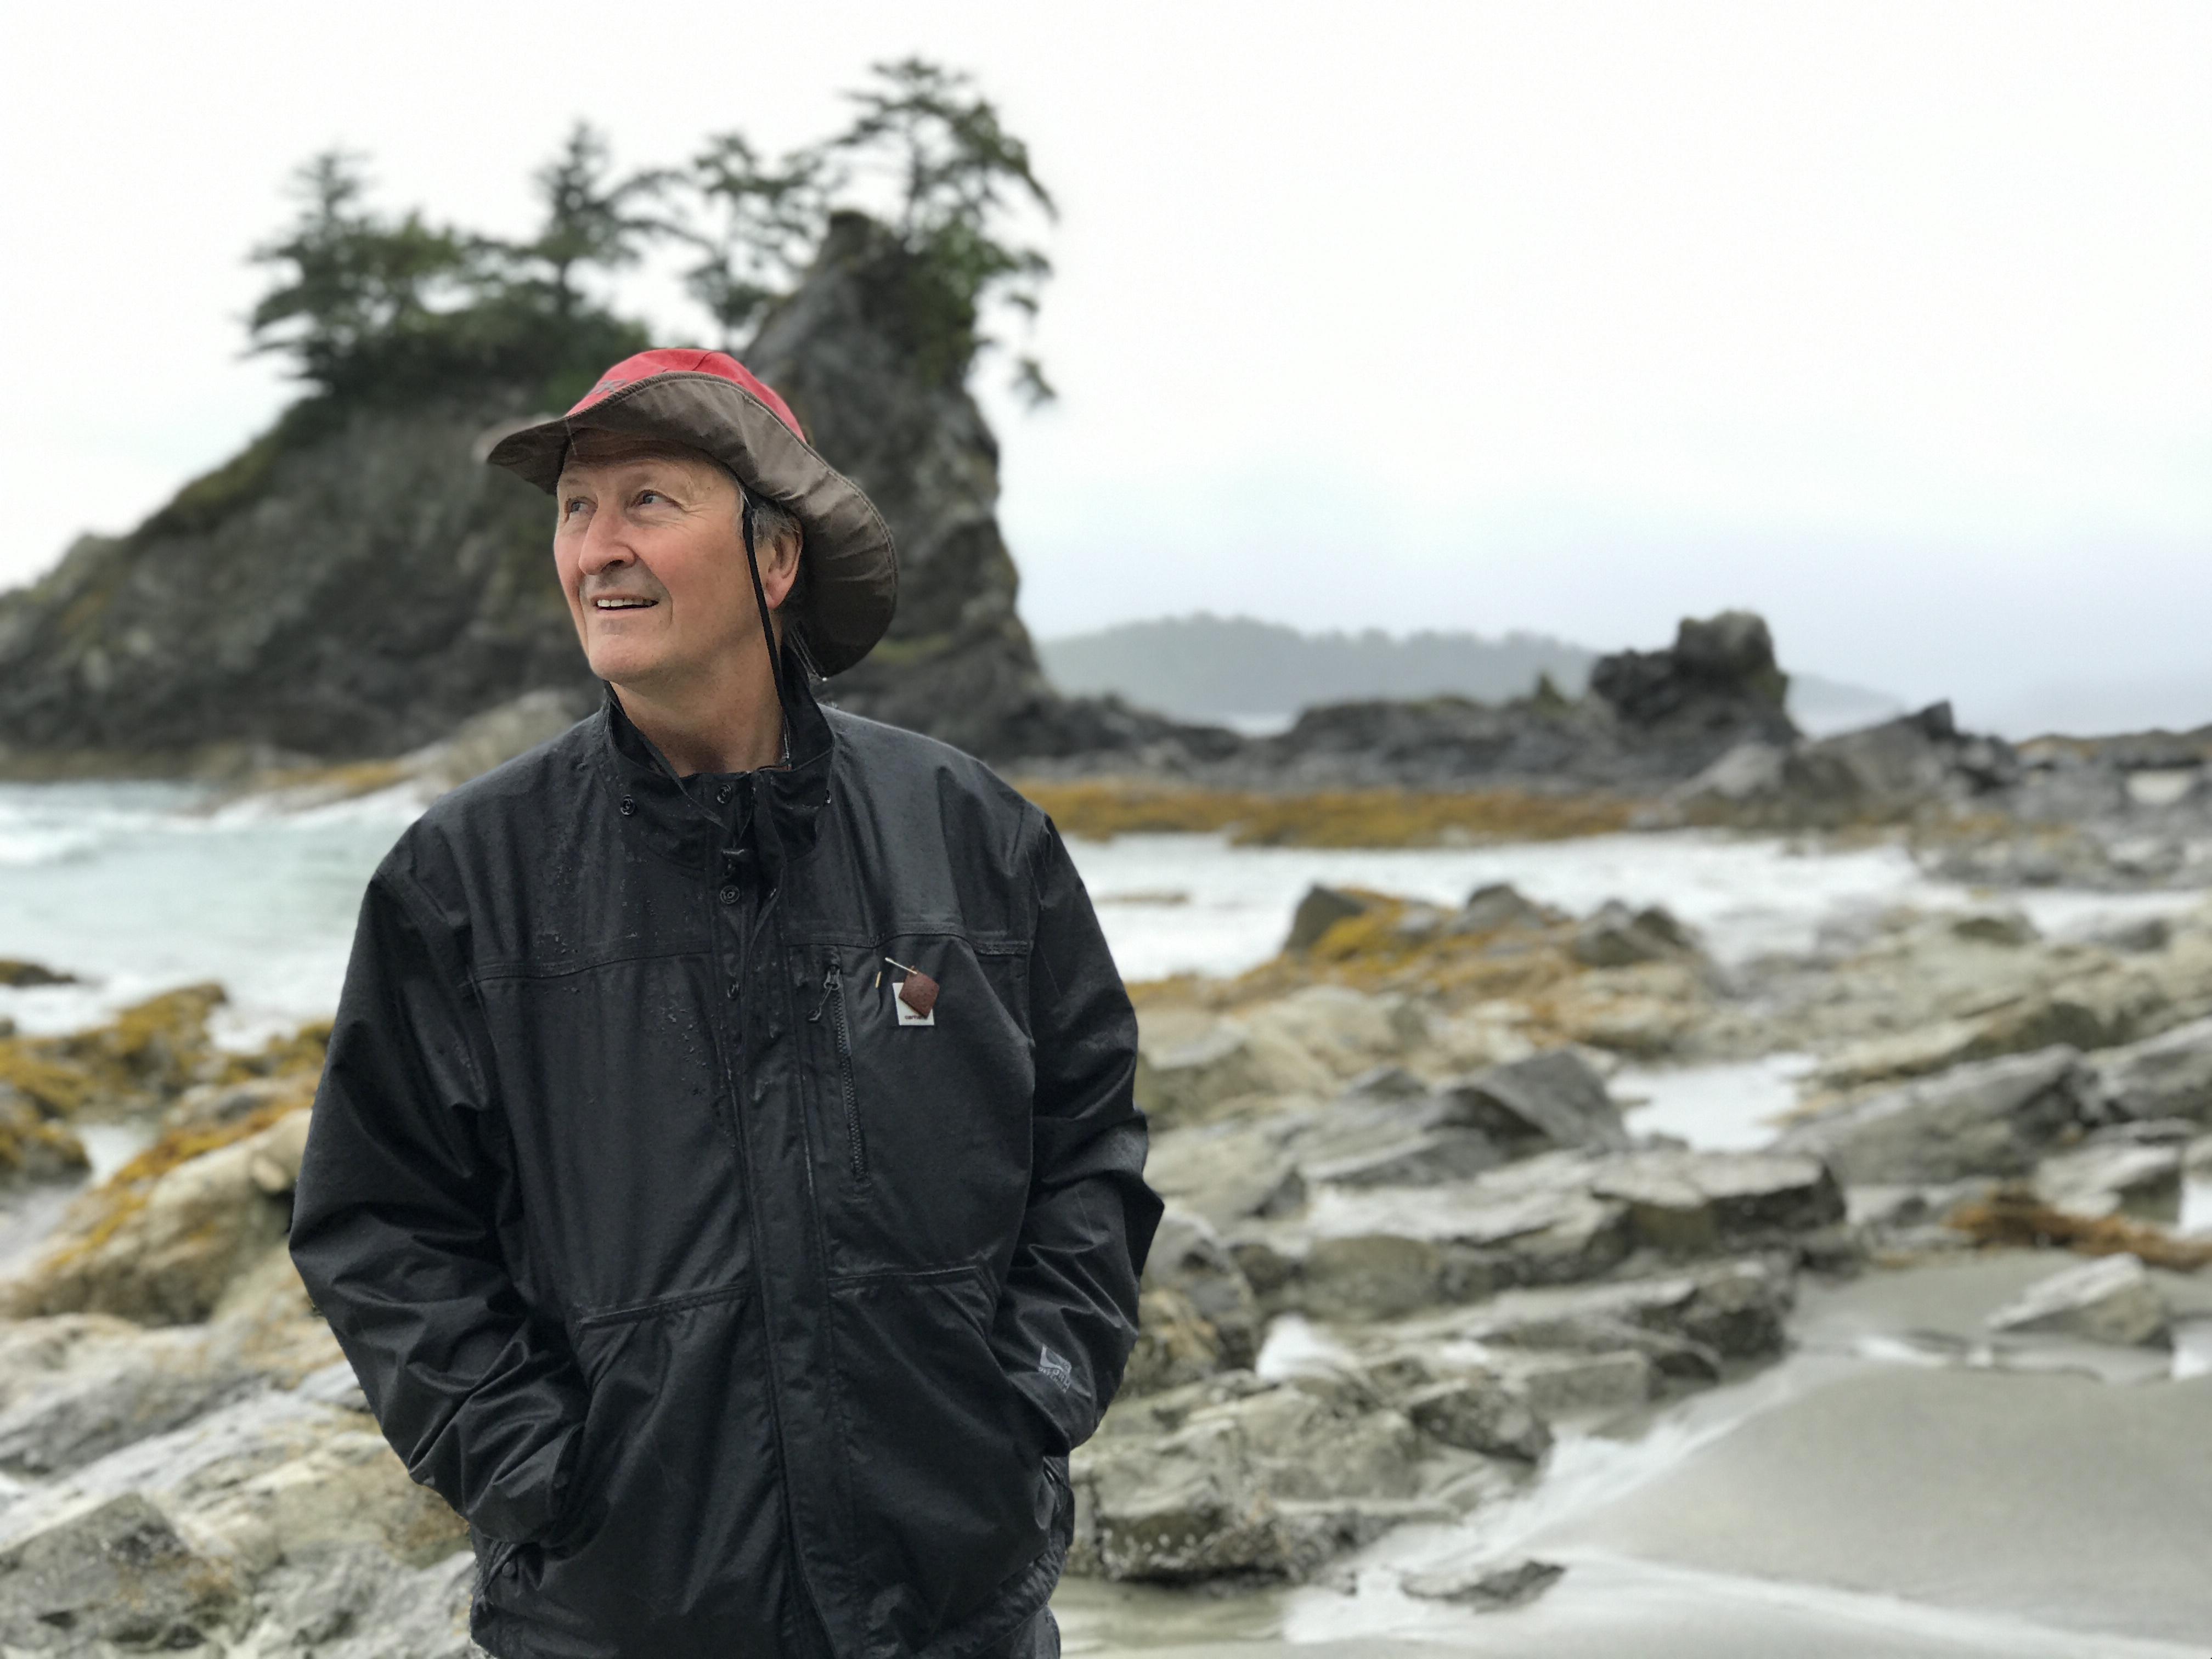 Keith Wyton, a Bamfield resident since 1979, watches an eagle fly away at Brady's Beach. (Megan Thomas/CBC)